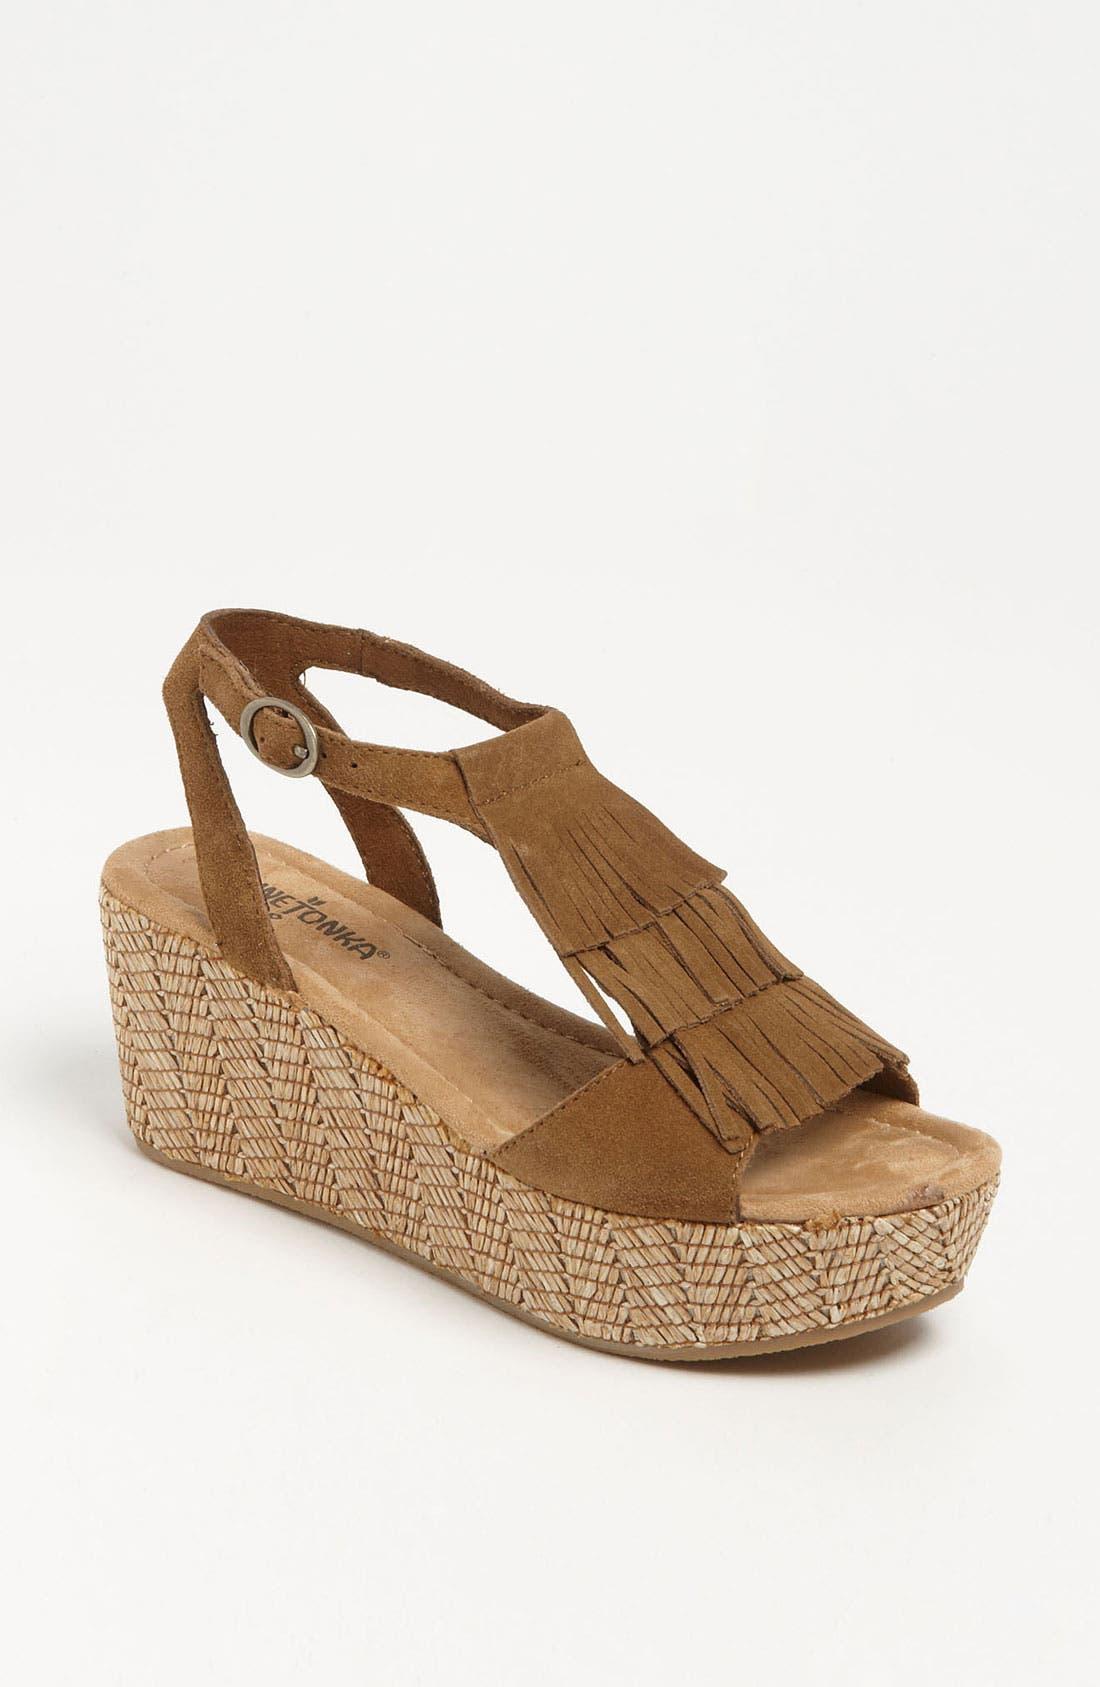 Main Image - Minnetonka 'Central' Sandal